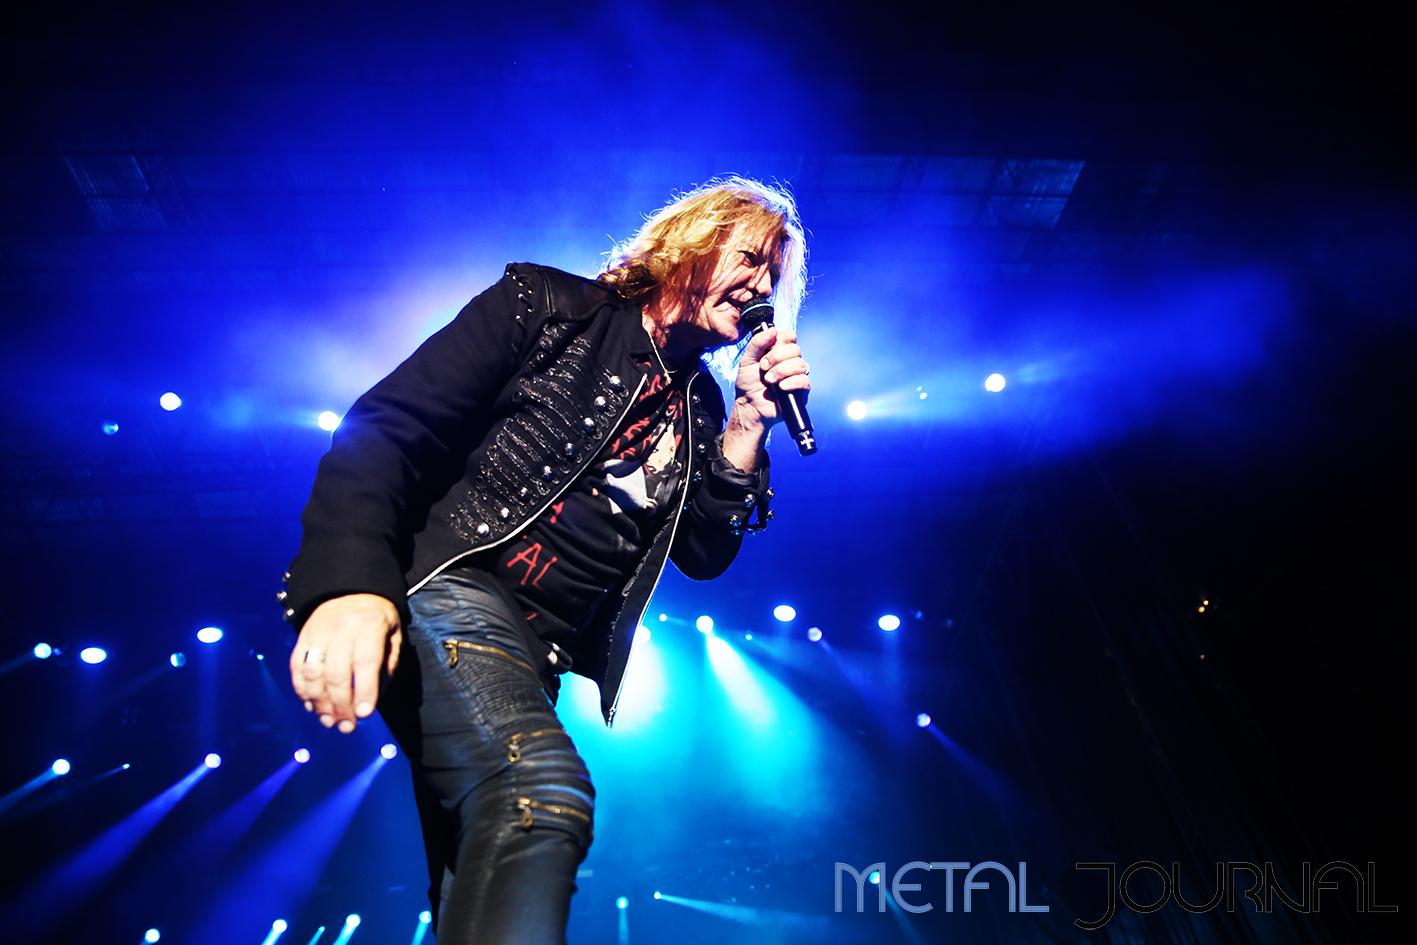 def leppard - metal journal rock fest barcelona 2019 pic 8